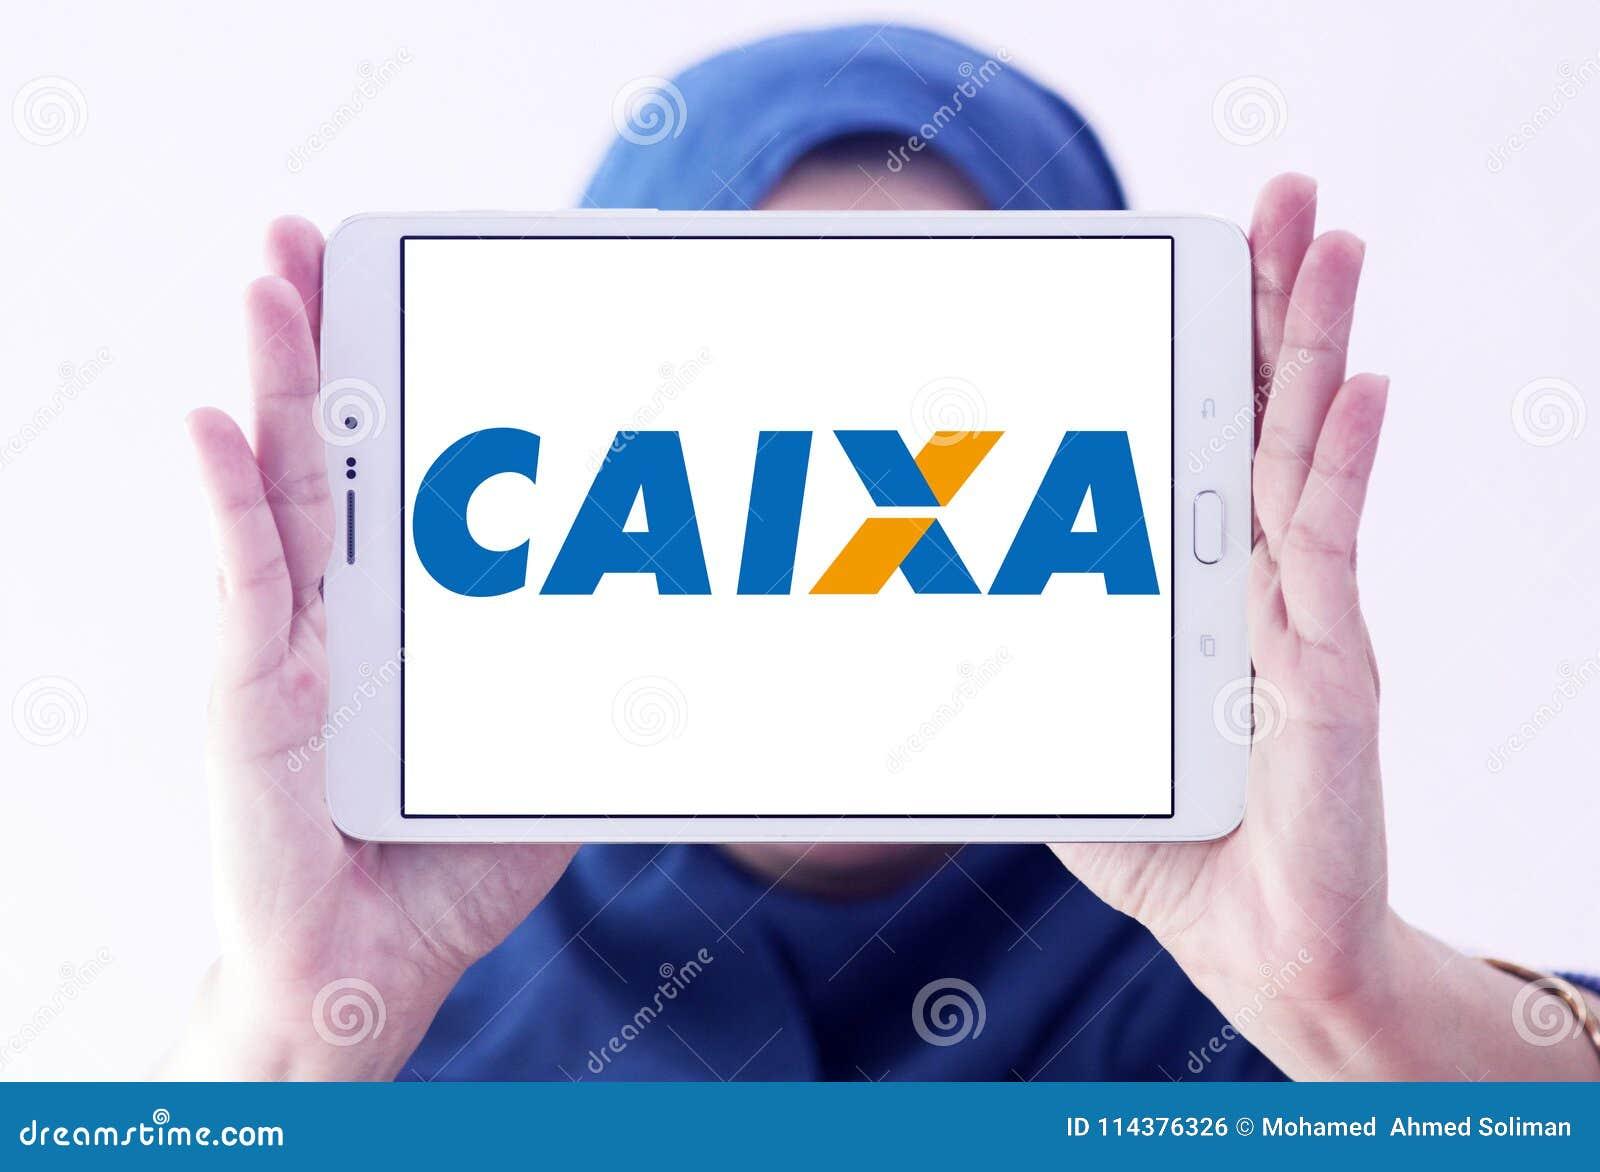 Caixa Economica联邦银行商标